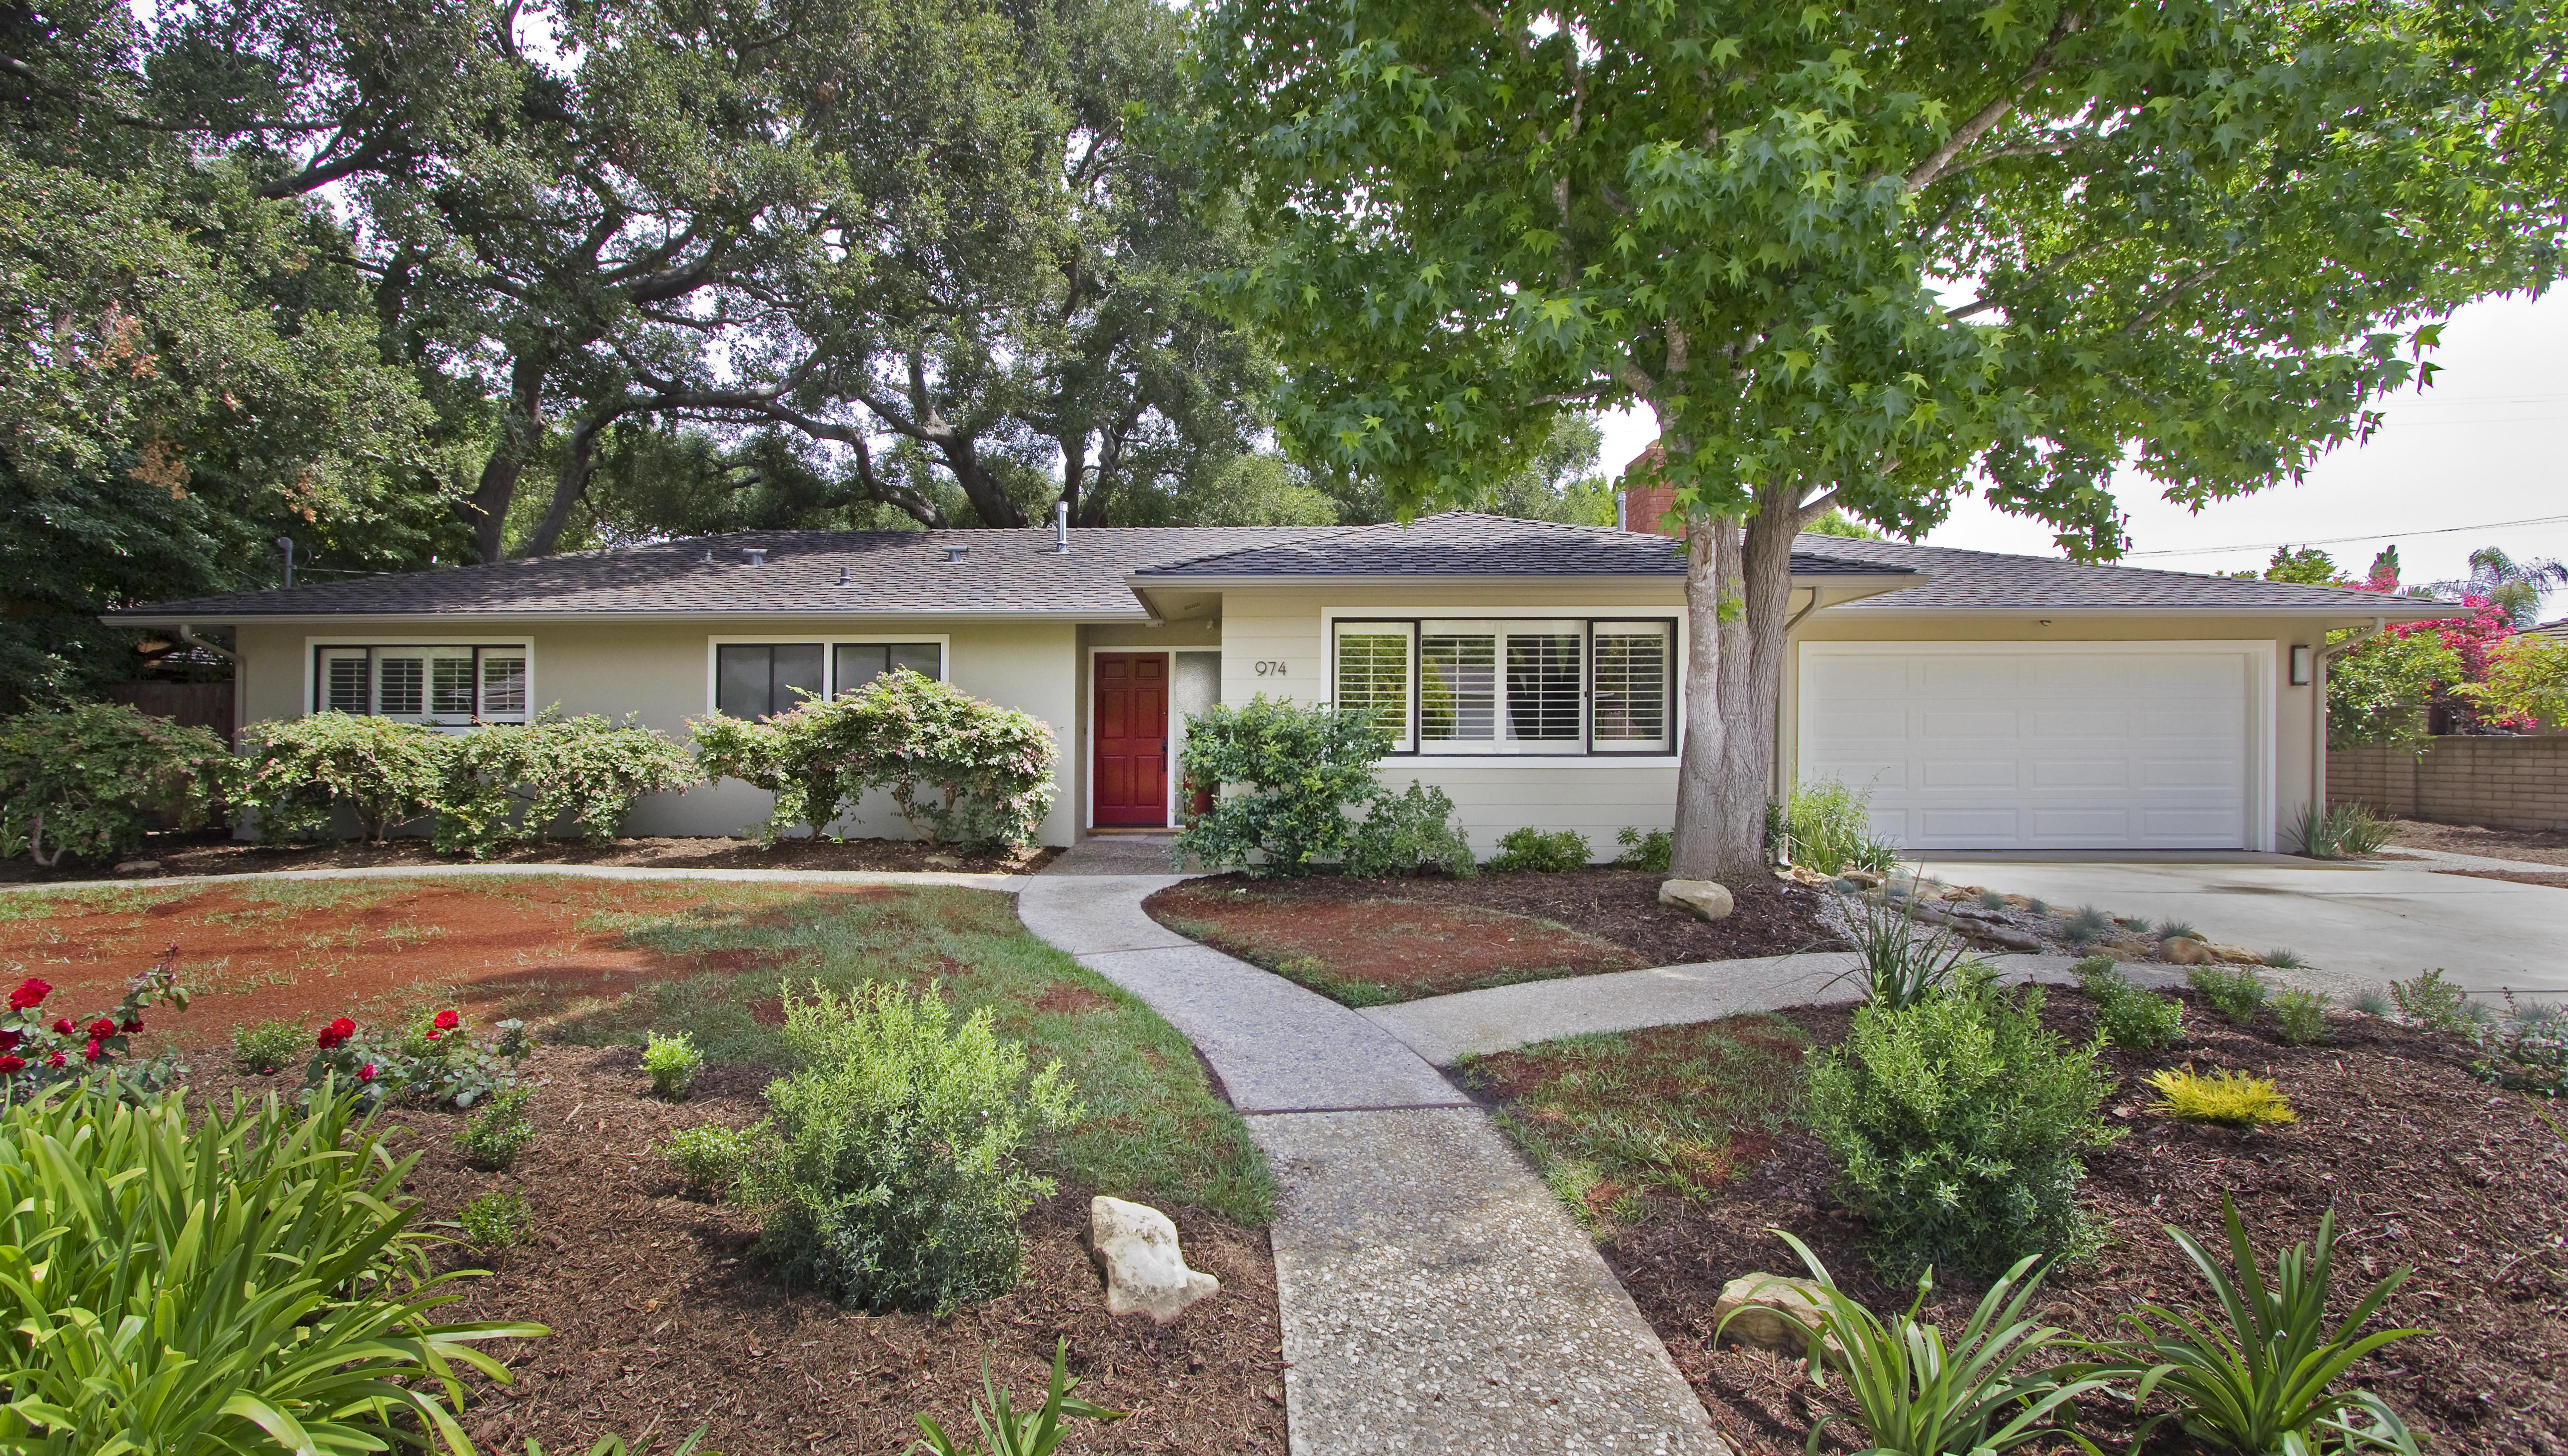 974 via campobello santa barbara real estate listing for Barbara house